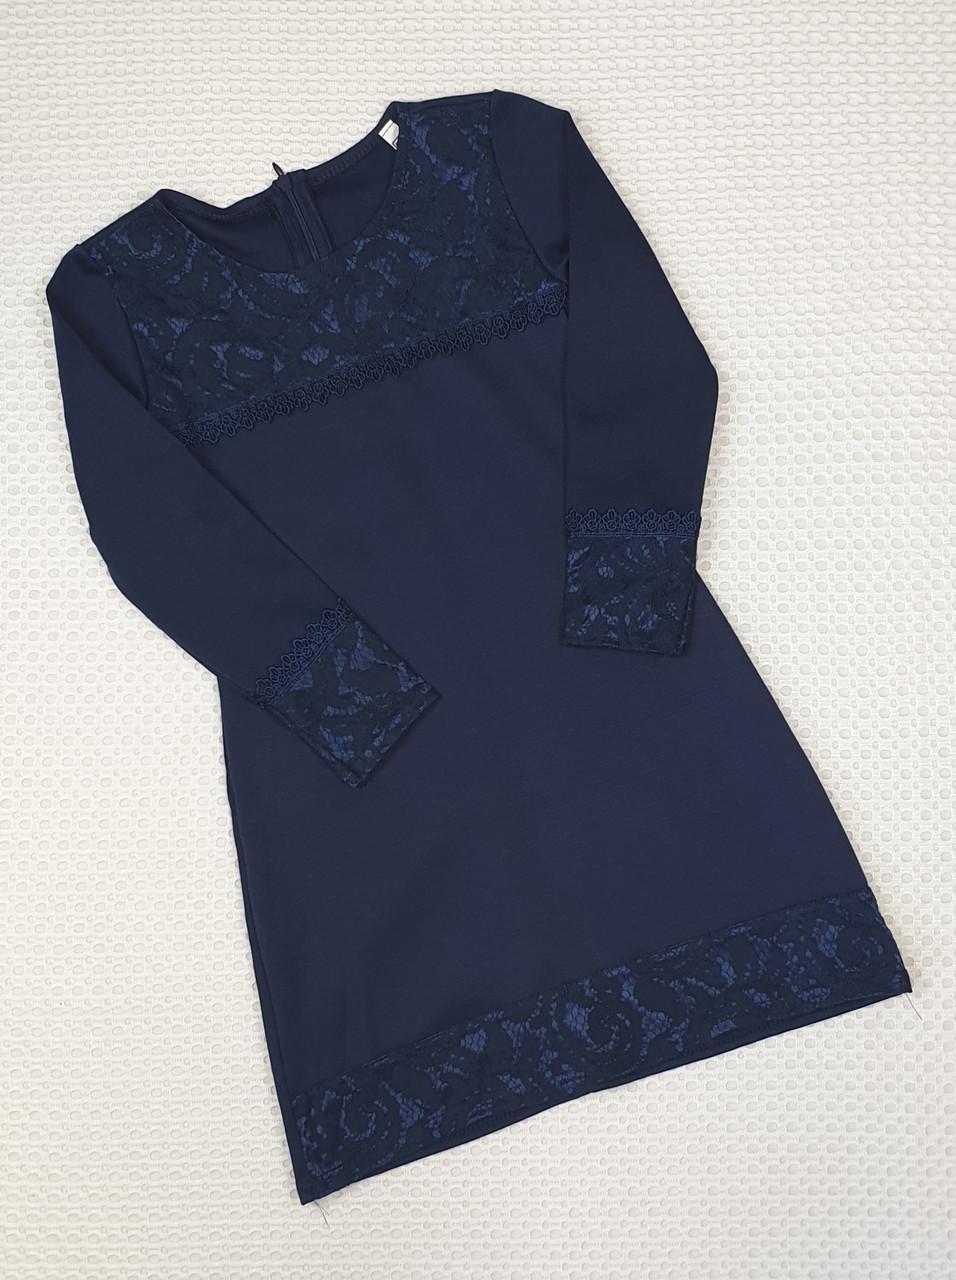 Школьное платье футляр 122-140 темно-синий